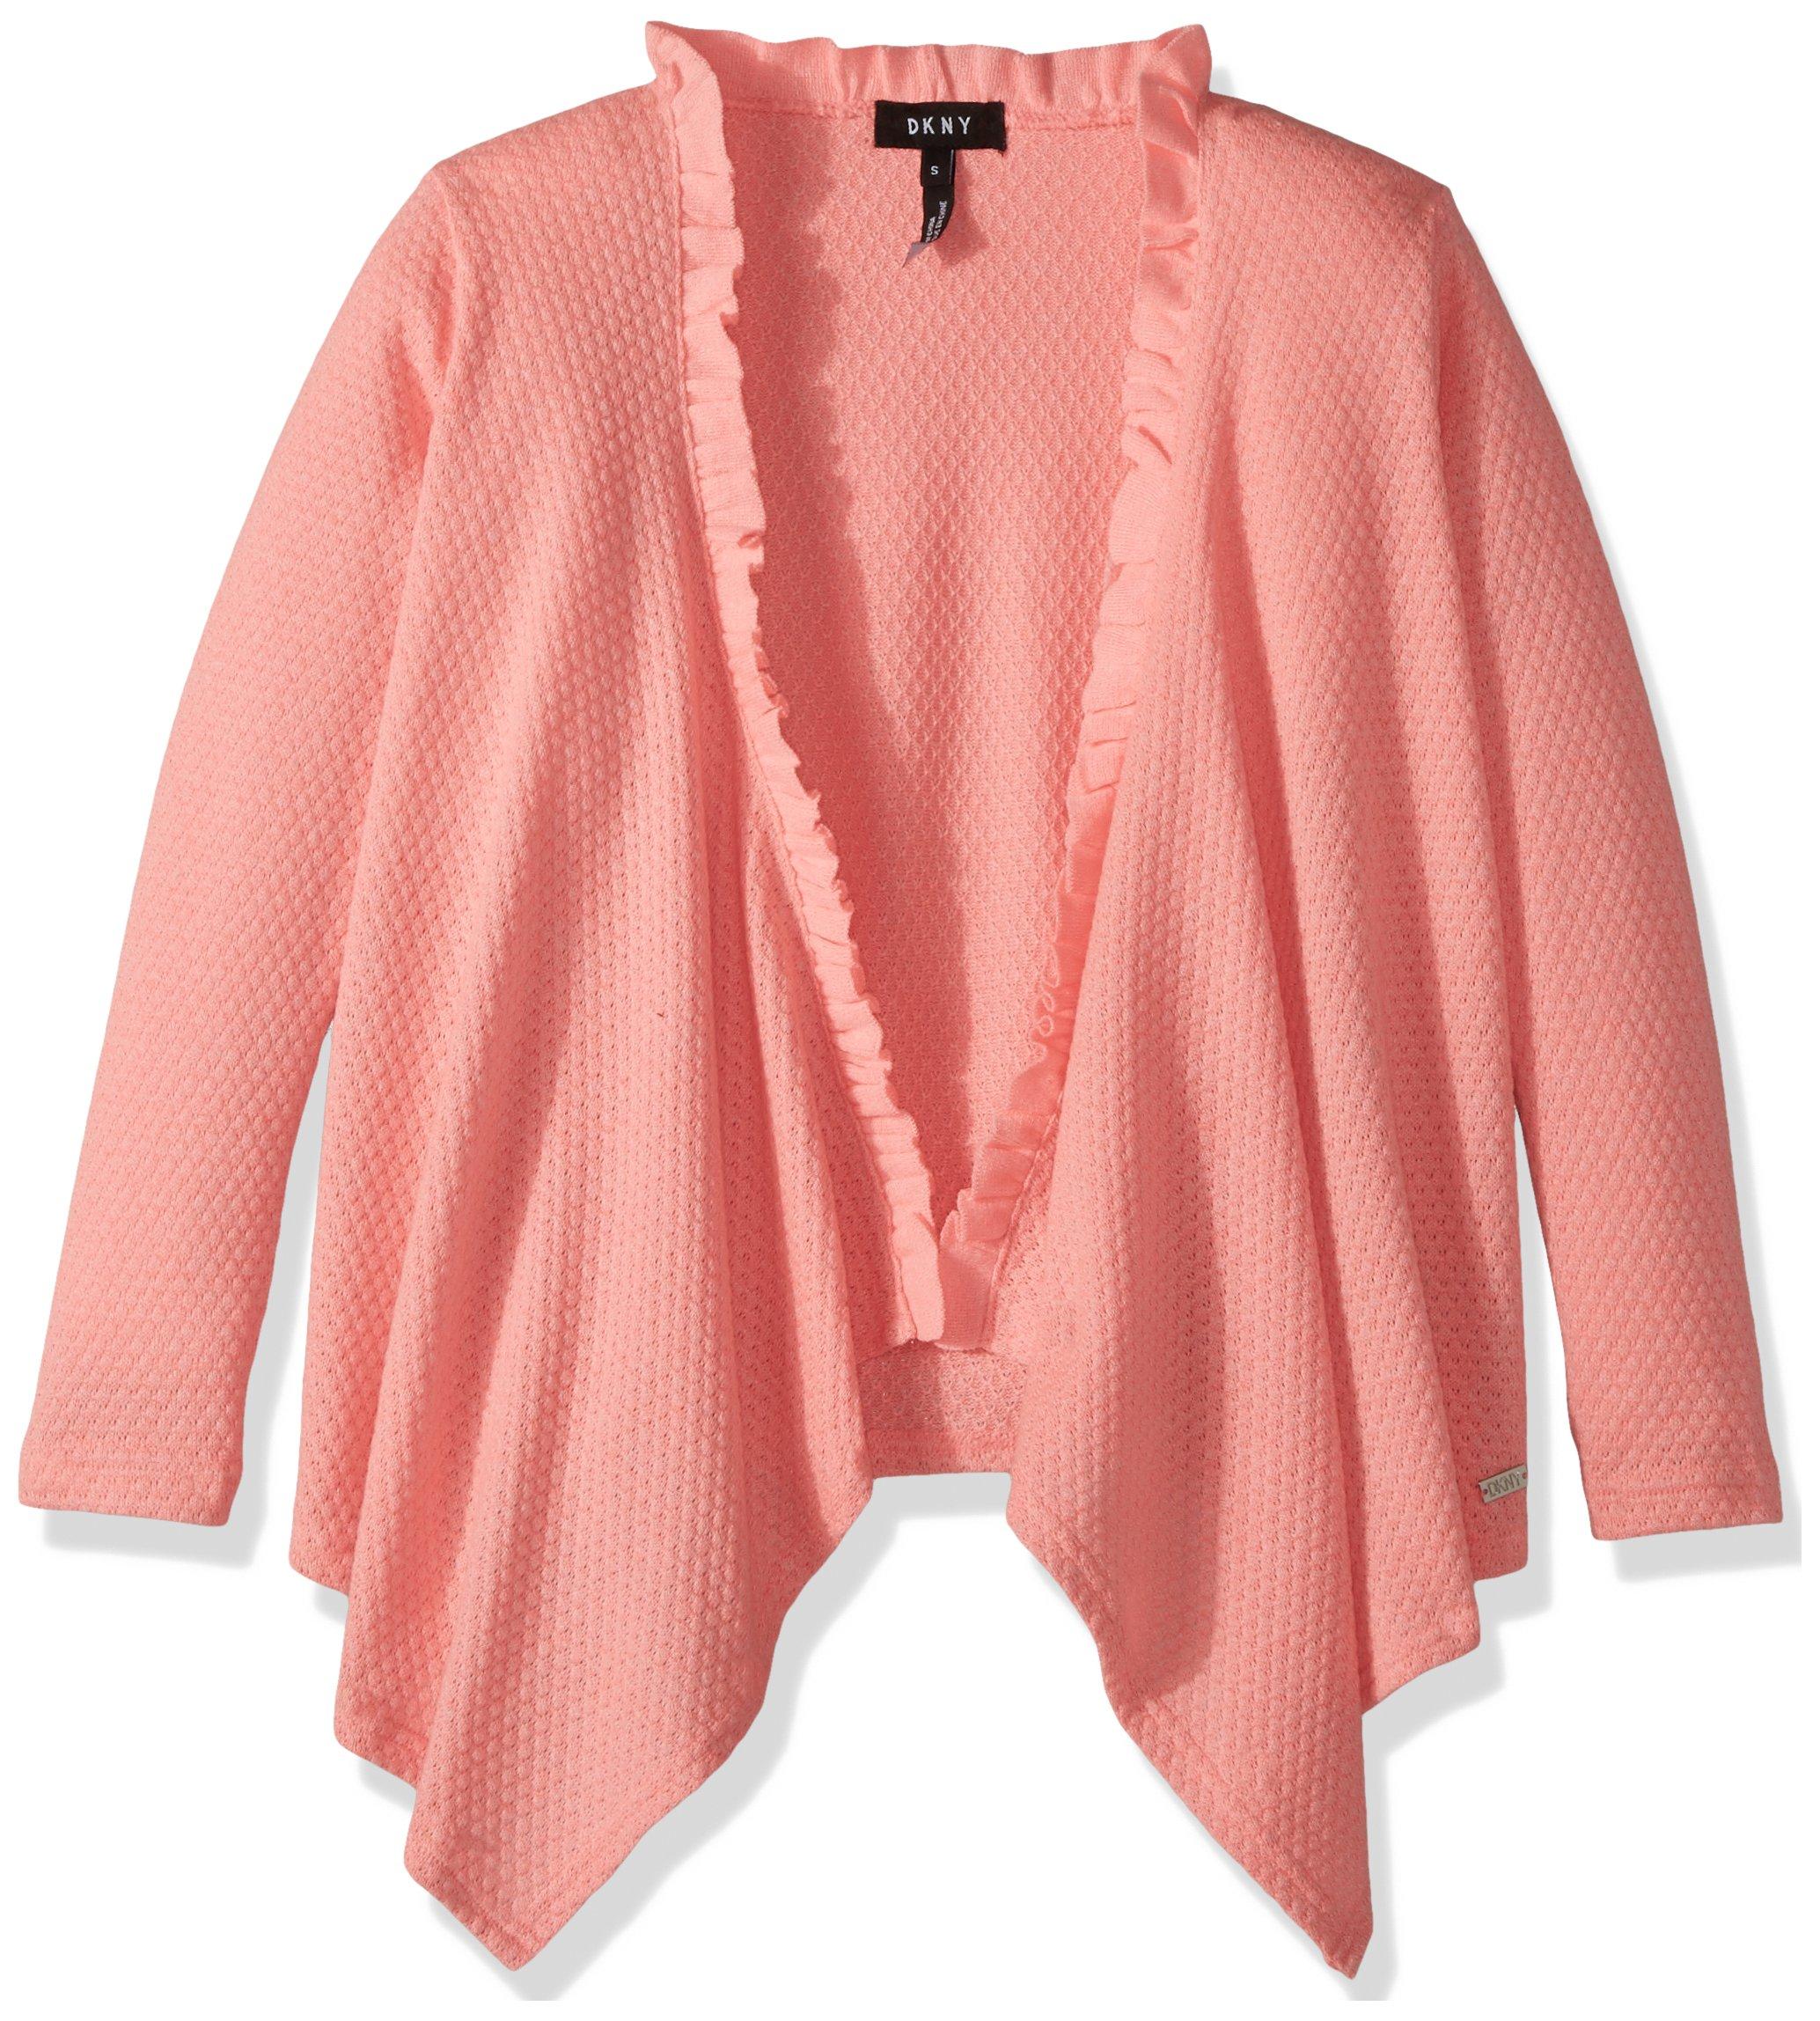 DKNY Big Girls' Sweater, Popcorn Cozy Hot Coral, 12